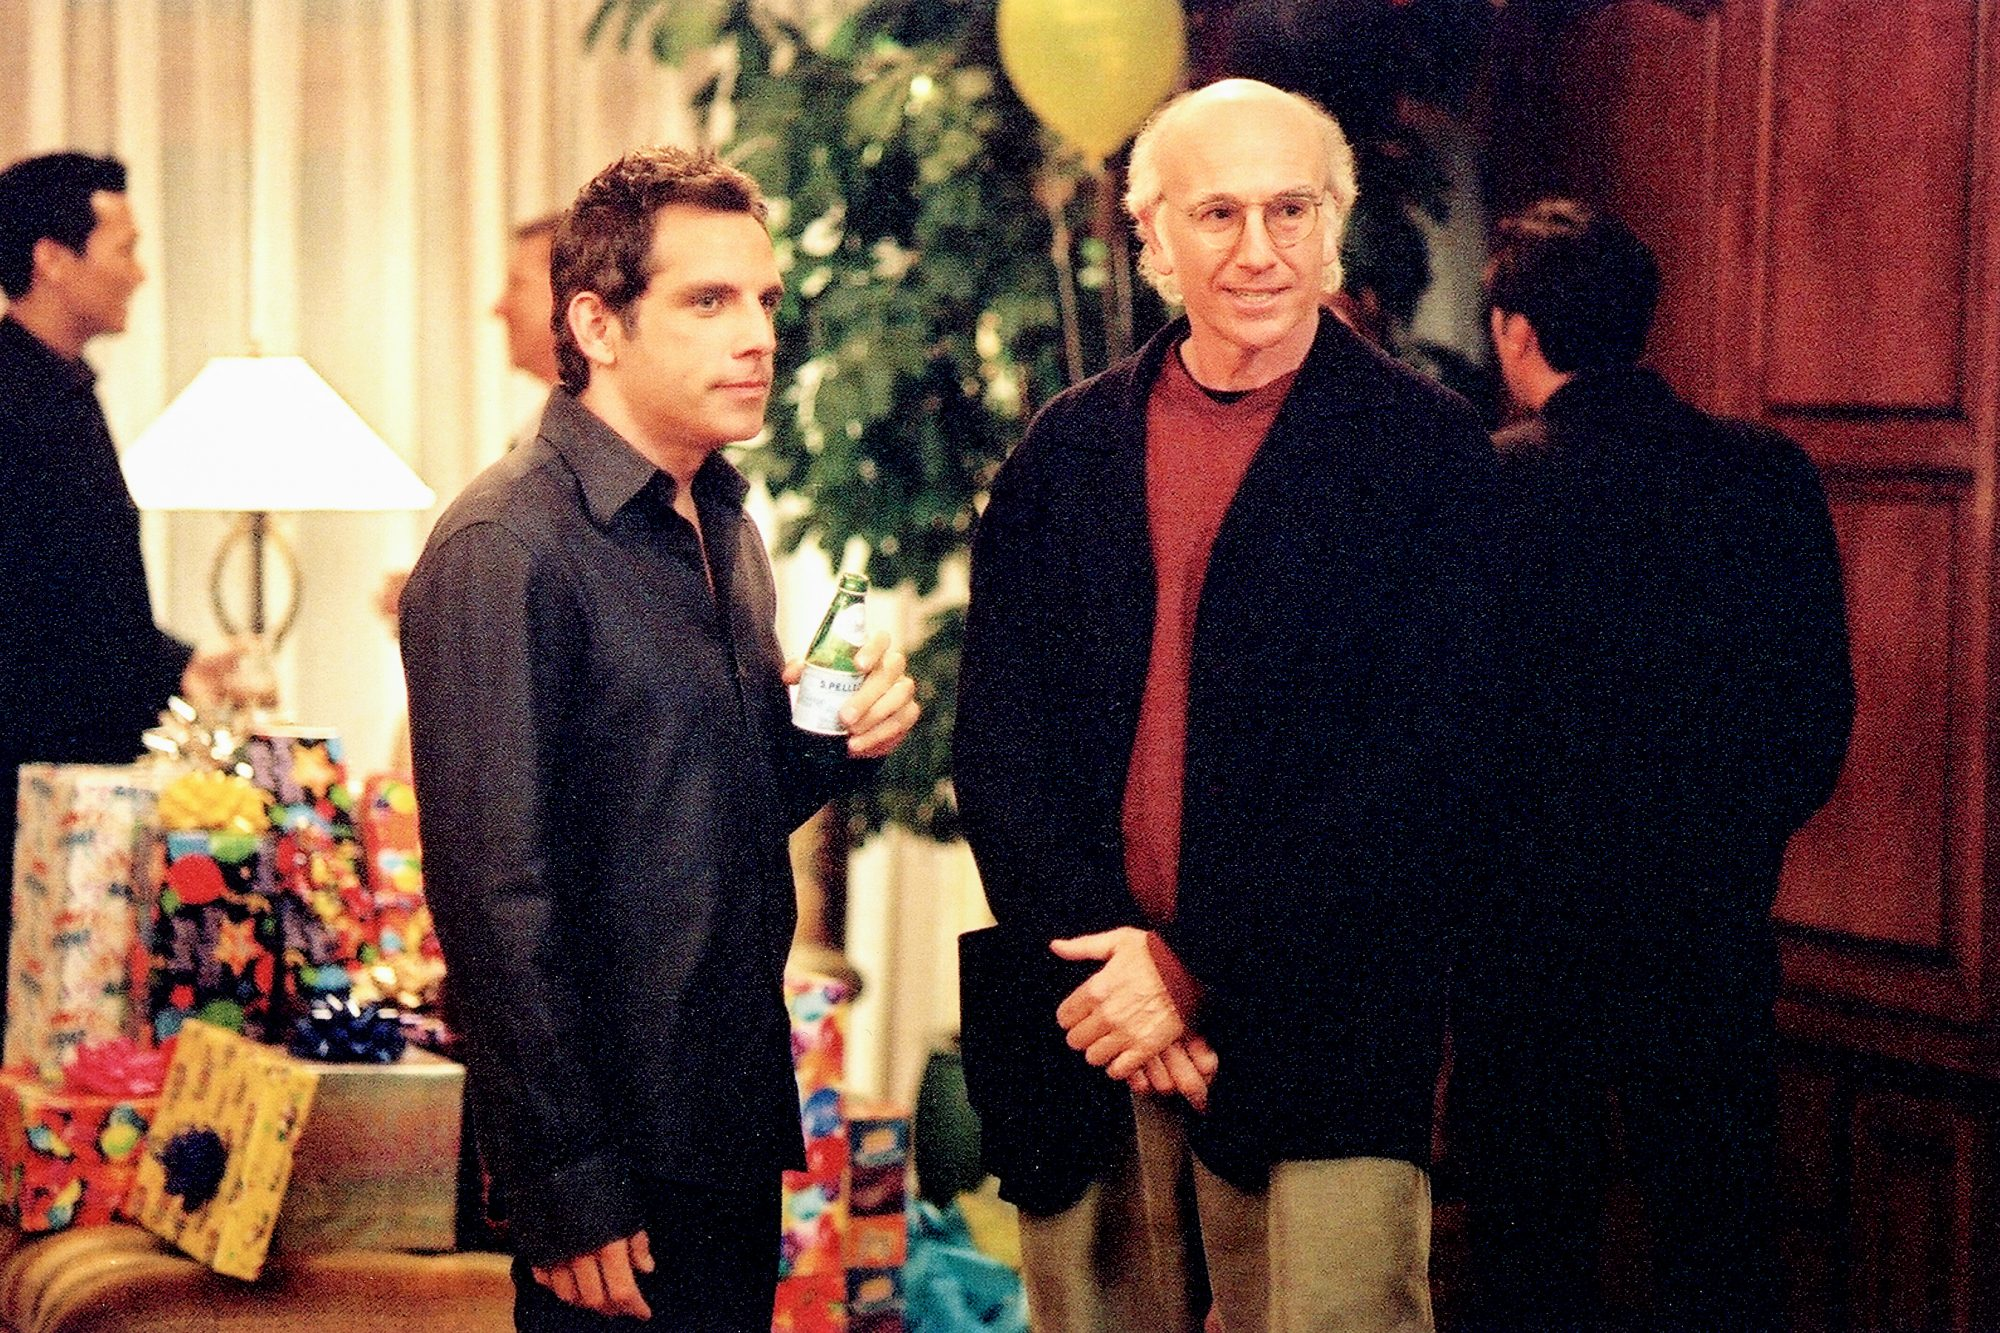 Curb Your Enthusiasm Season 4 (2004)L-R: Ben Stiller and Larry David